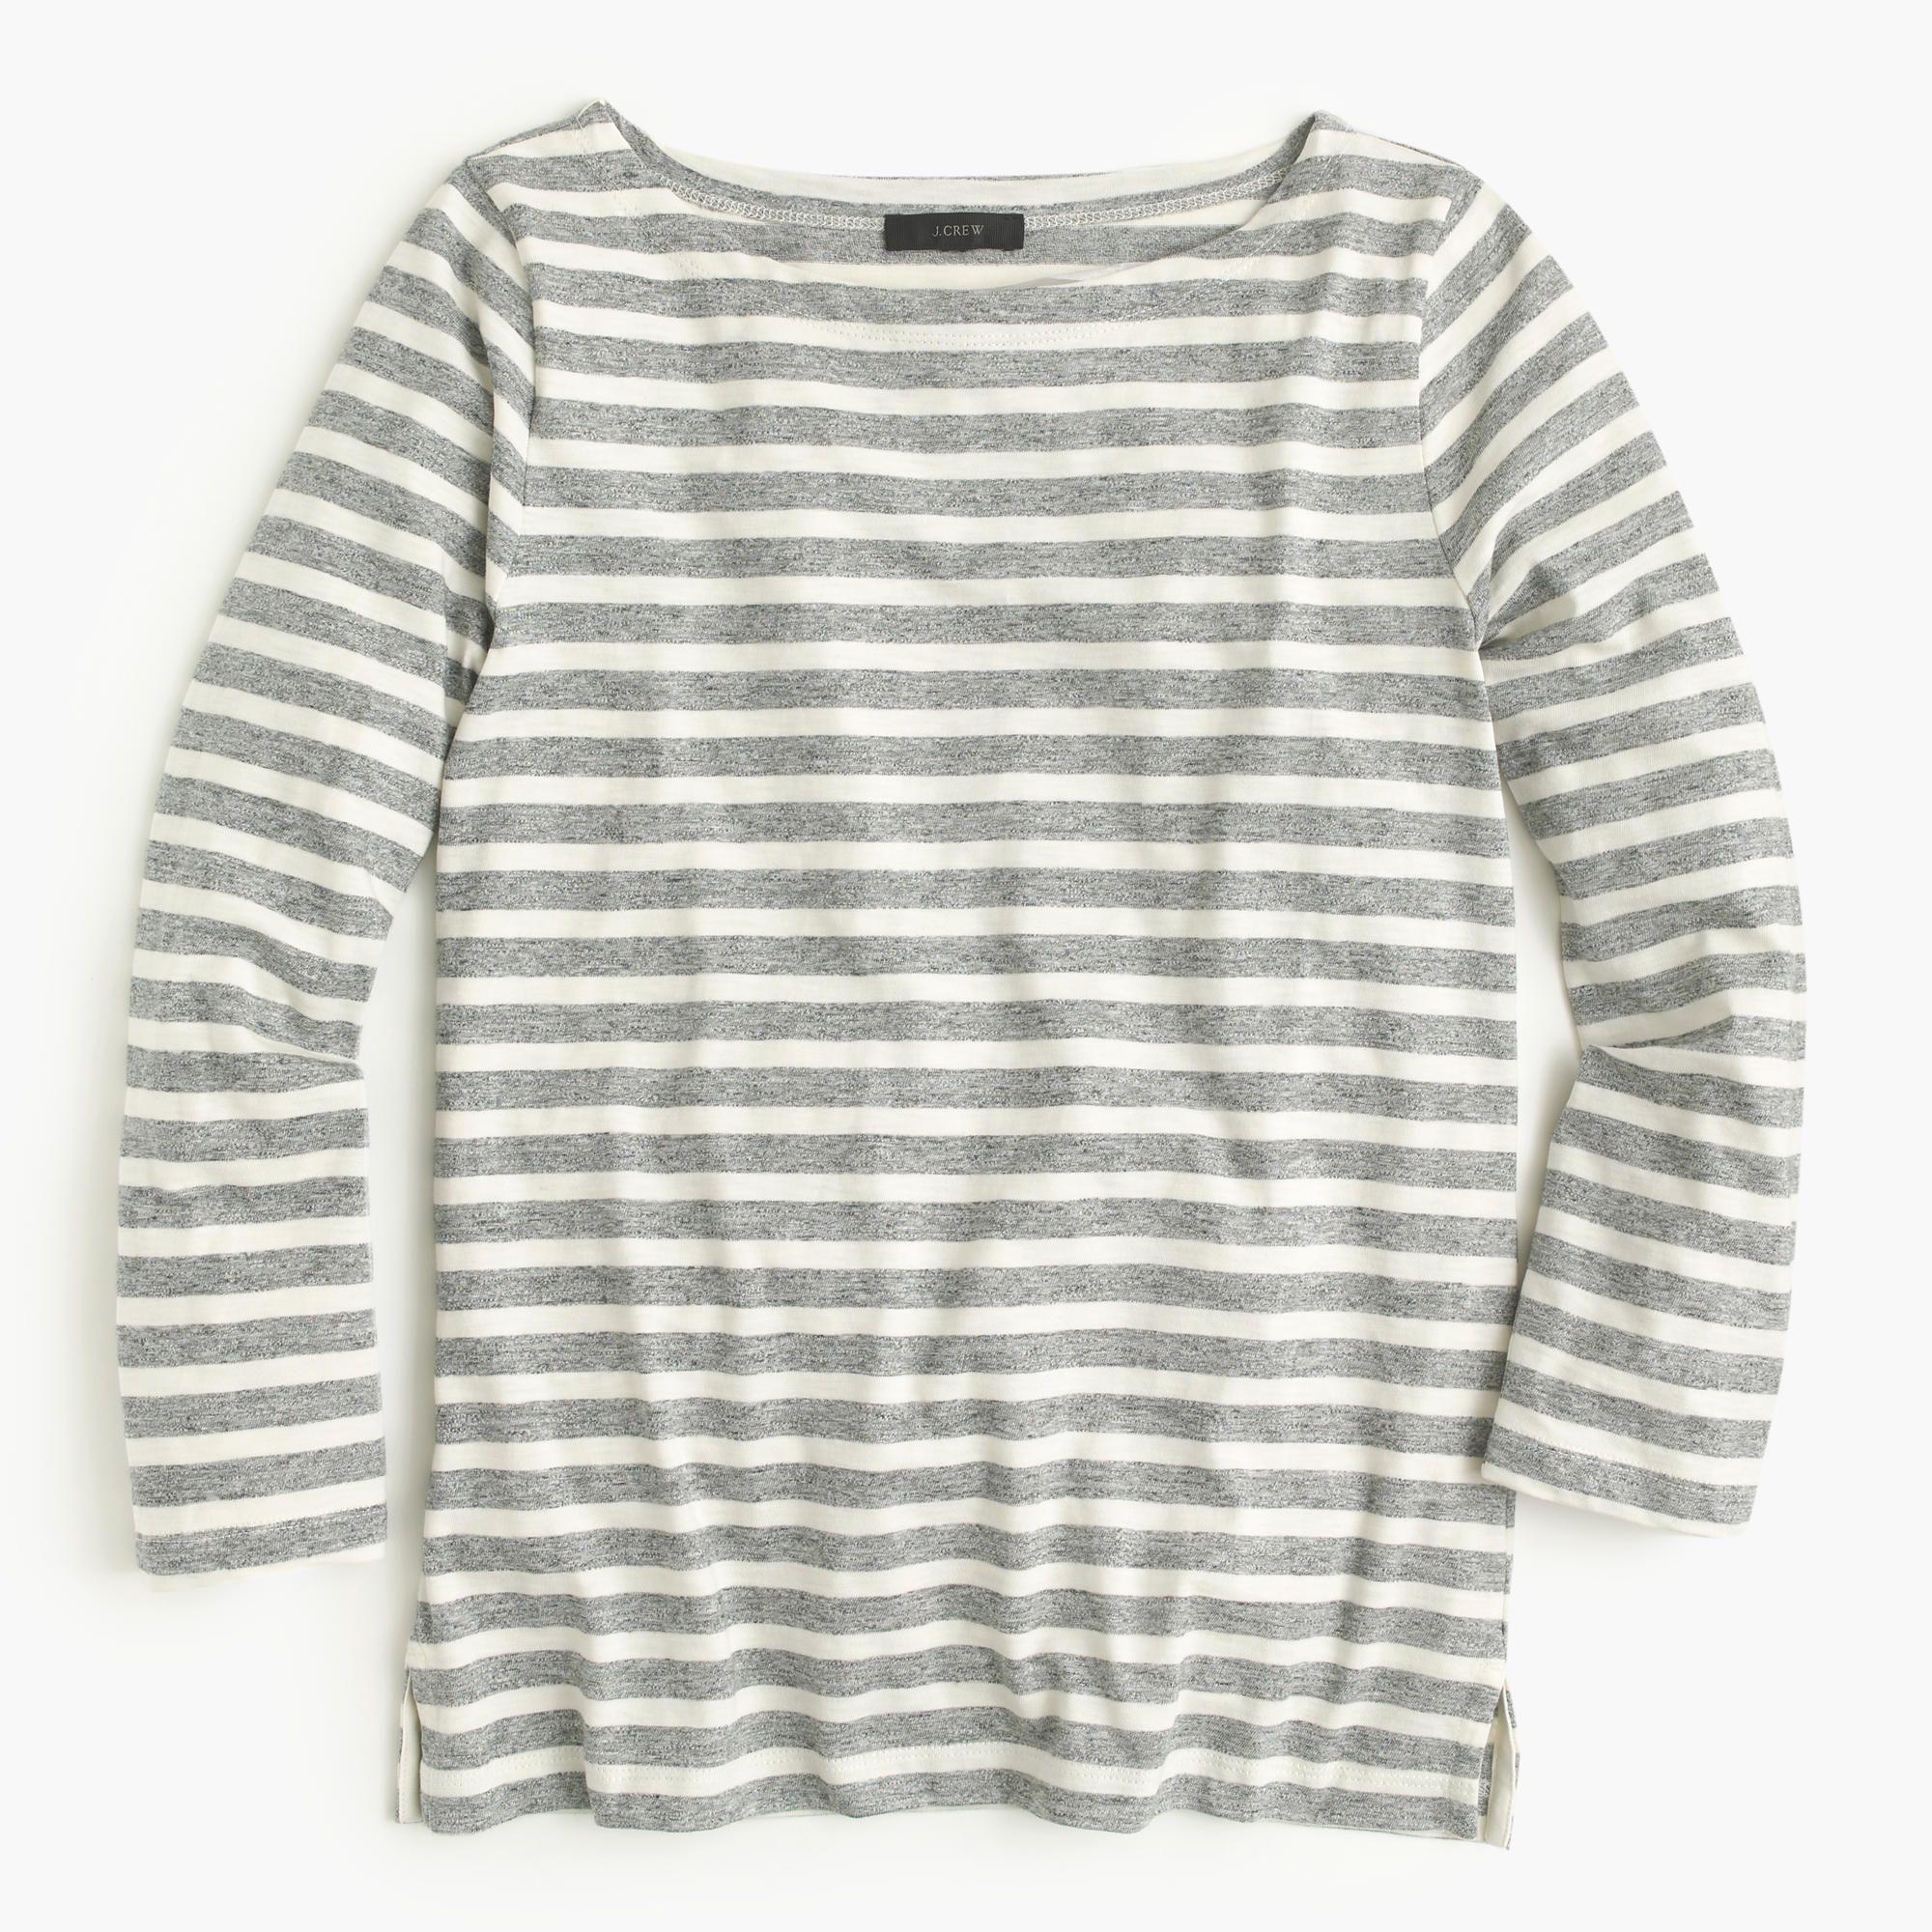 Striped boatneck T-shirt : classic tees | J.Crew